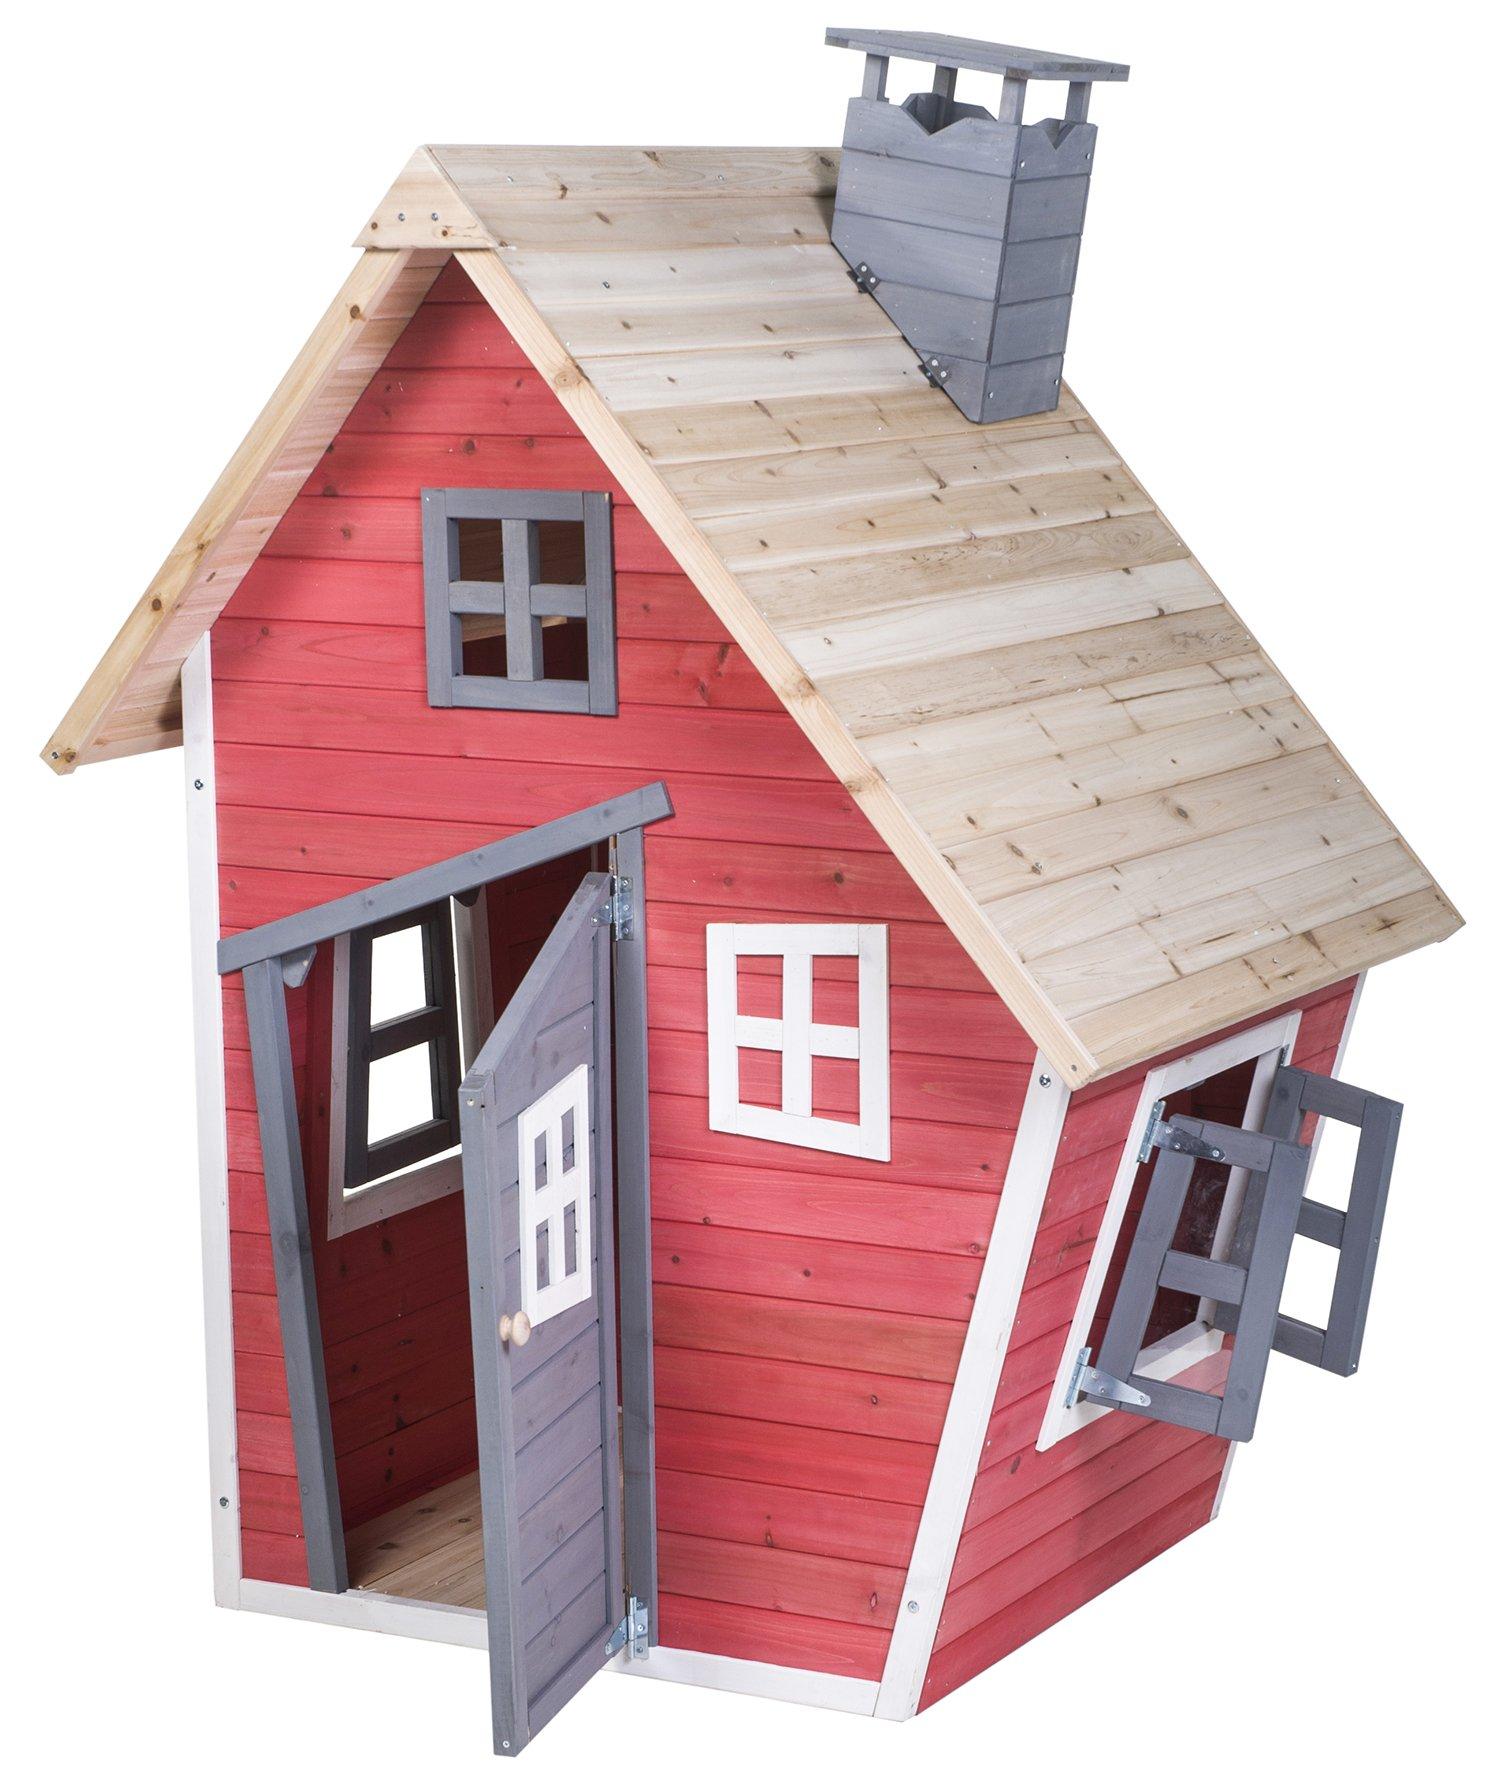 Merax® Children's Wood Playhouse Indoor Outdoor Backyard Environmental Friendly Paint